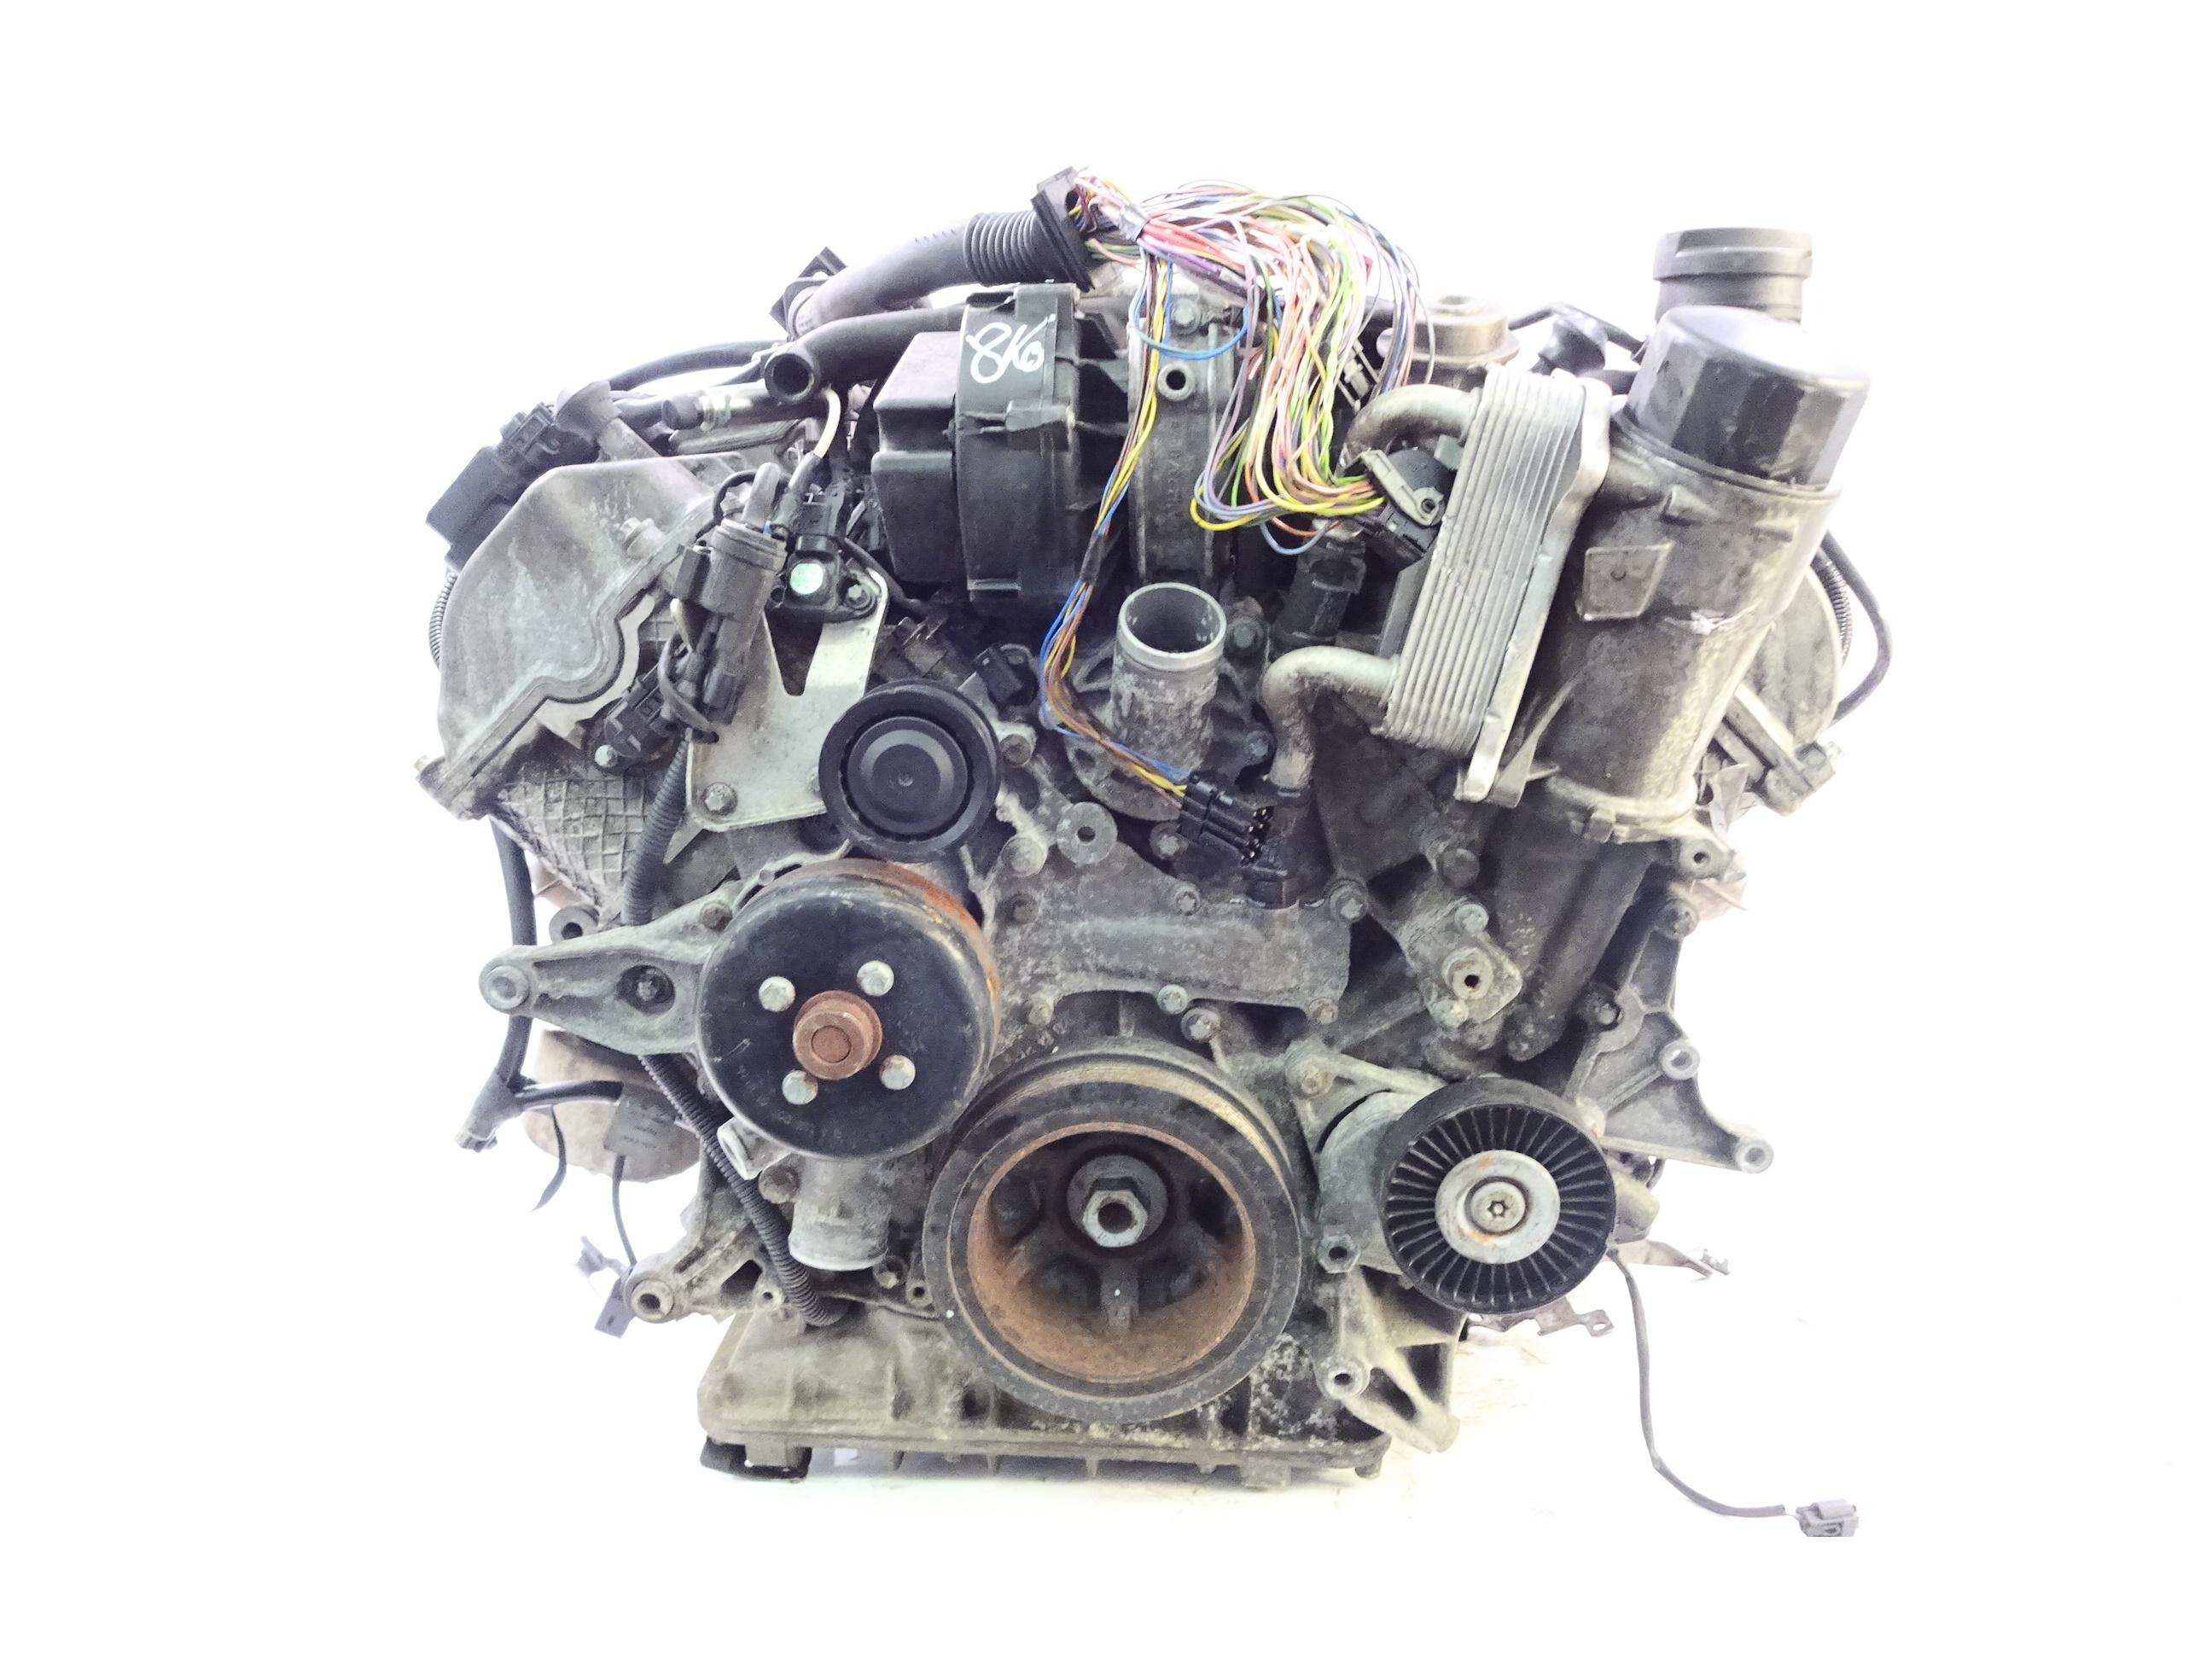 Motor 2005 Mercedes Benz CLK C209 A209 320 3,2 Benzin 112.955 mit Anbauteilen